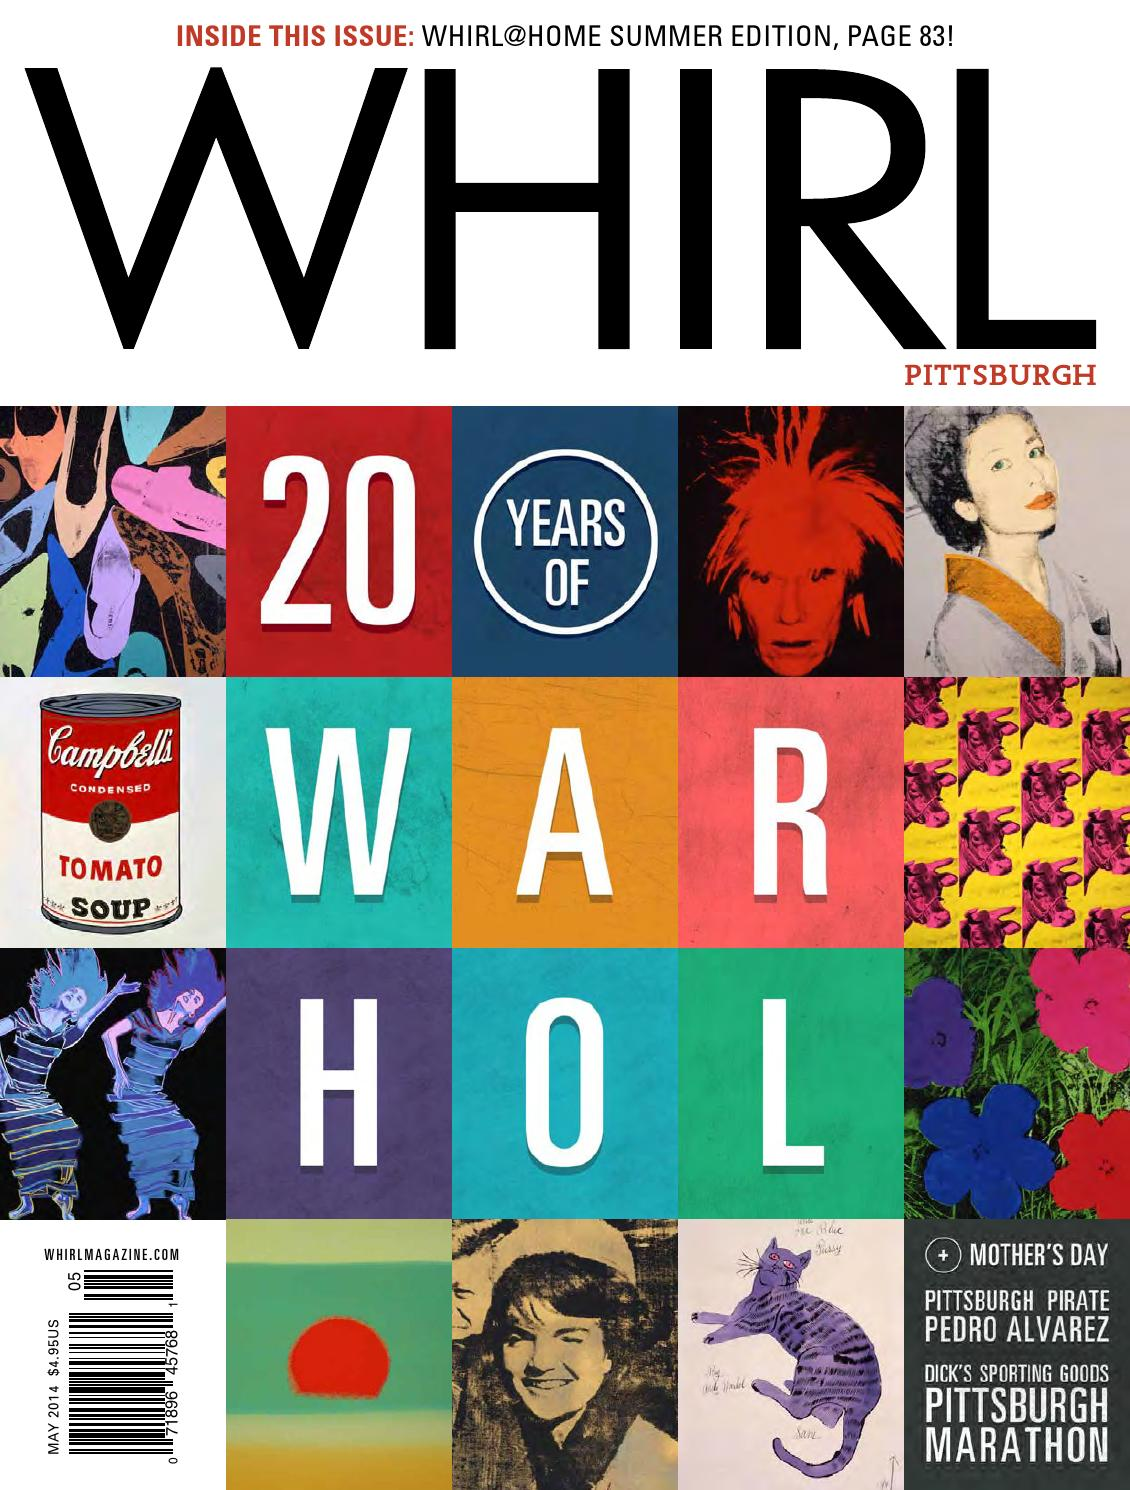 WHIRL Magazine - May 2014 by WHIRL Publishing - issuu